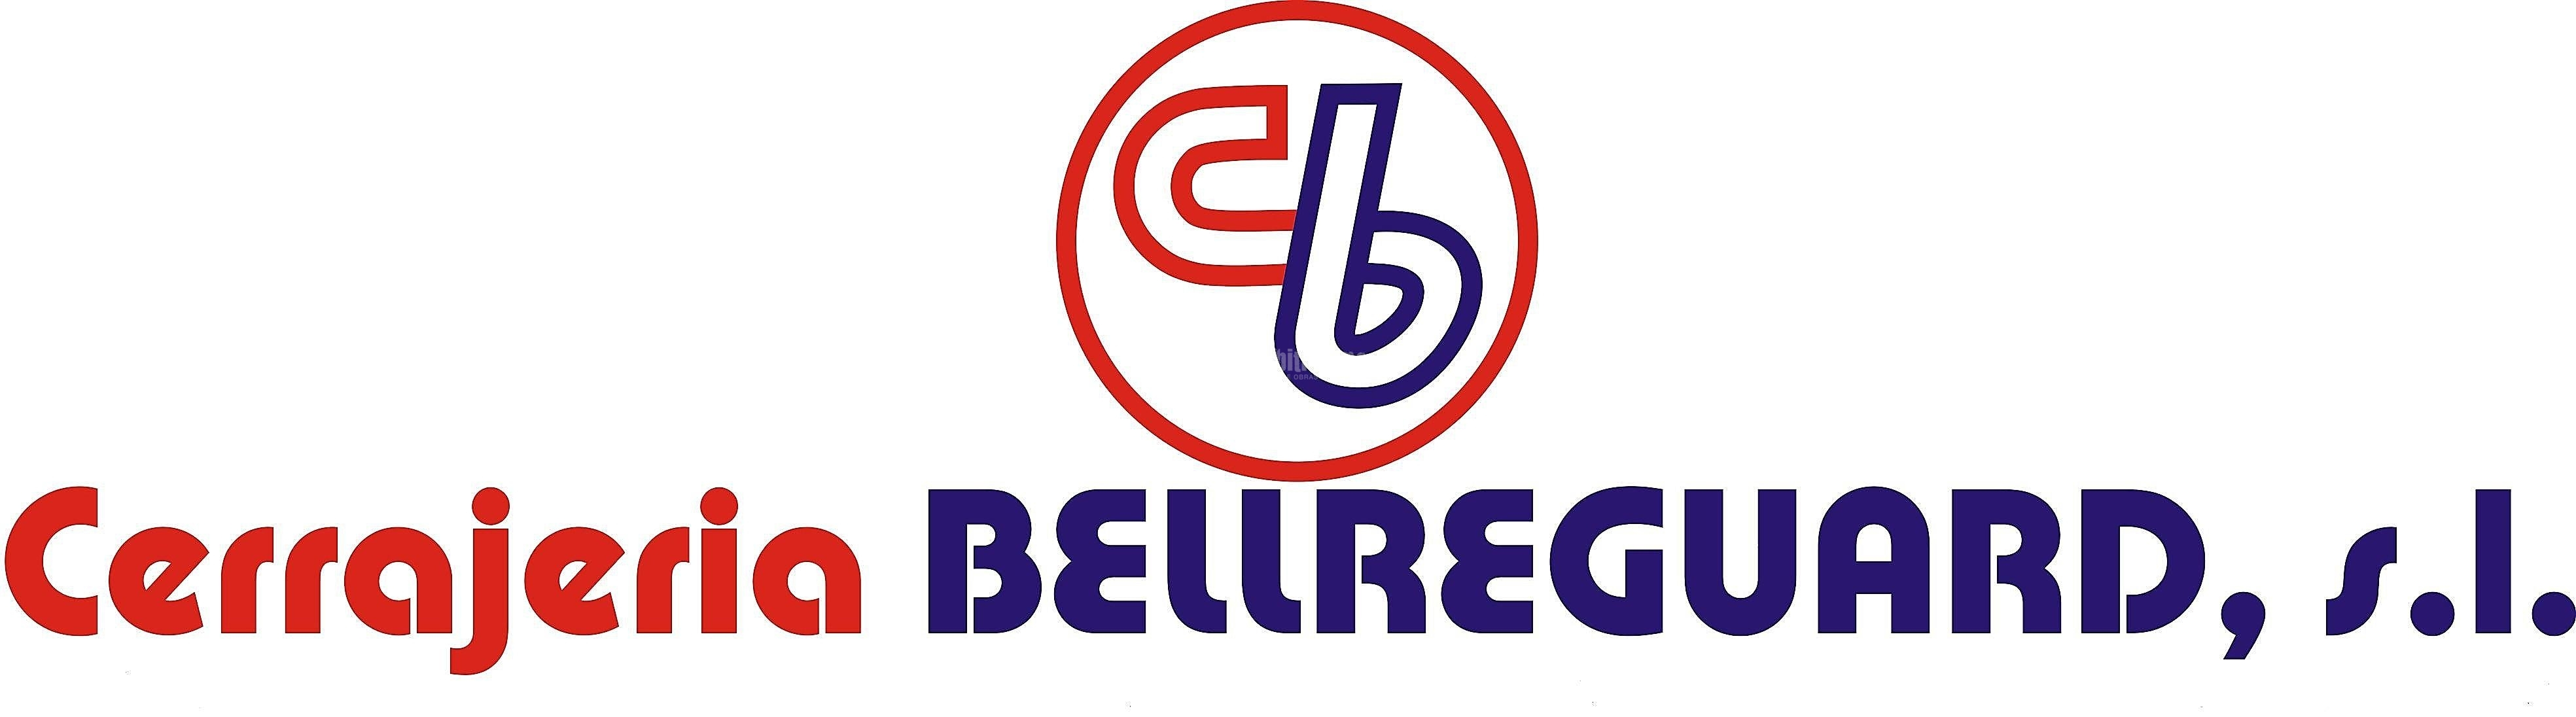 Cerrajeria Bellreguard S.L.